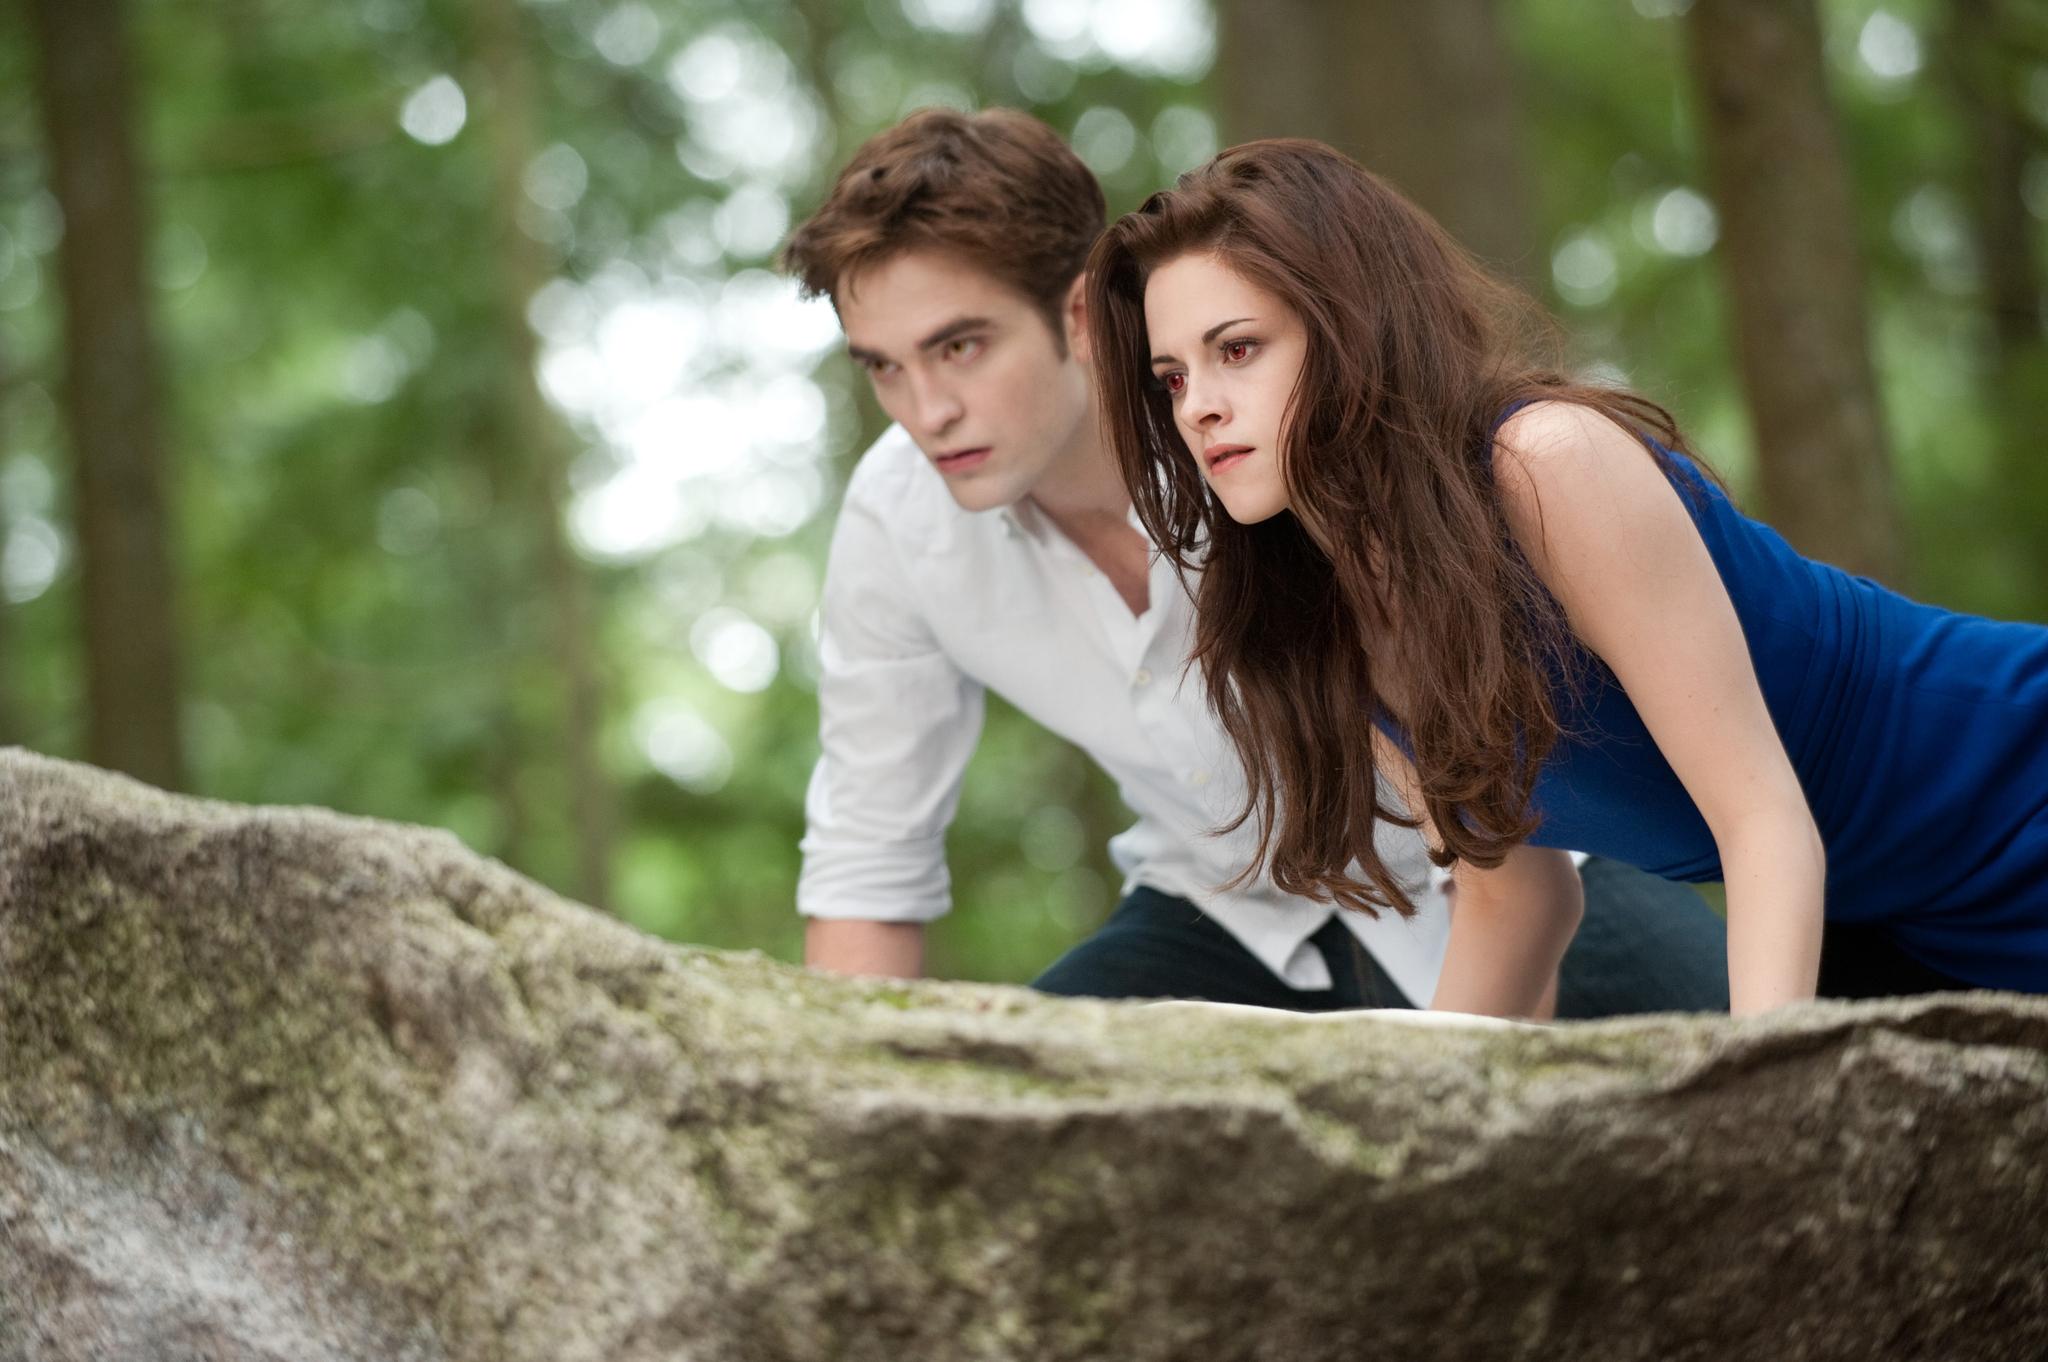 The Twilight Saga: Breaking Dawn - Part 2 (2012).